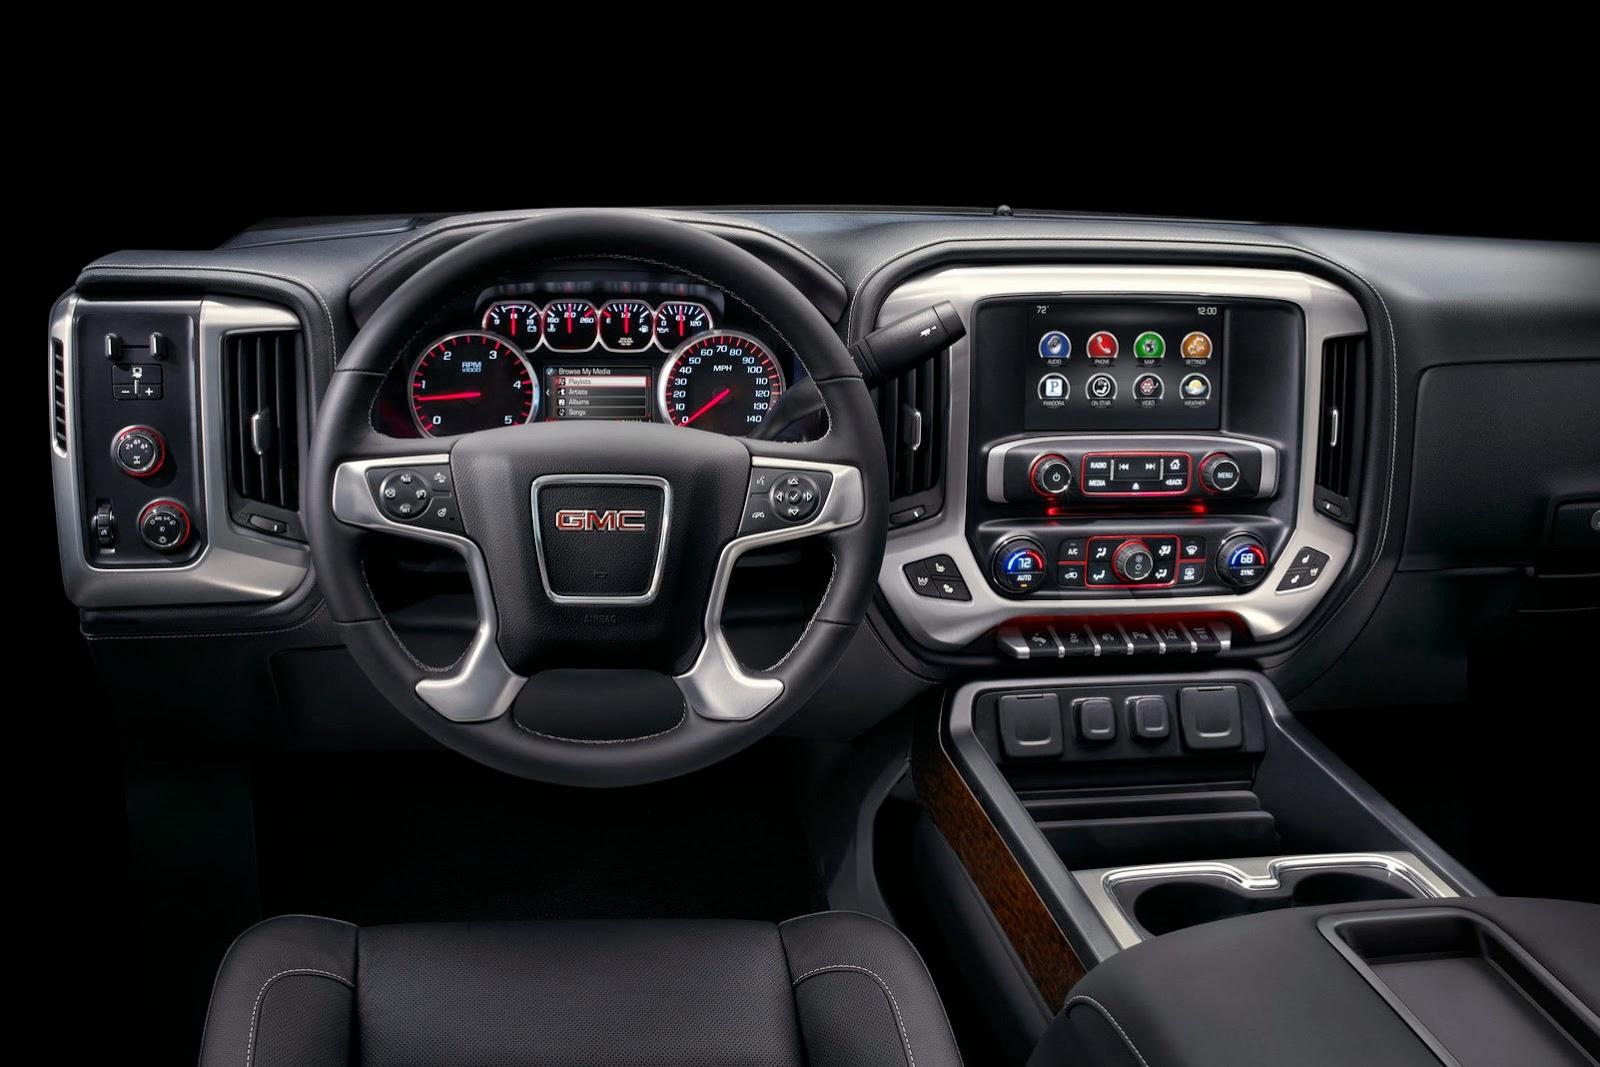 2015 Sierra 2500 Heavy Duty Pickup Trucks Dashboard and Cockpit